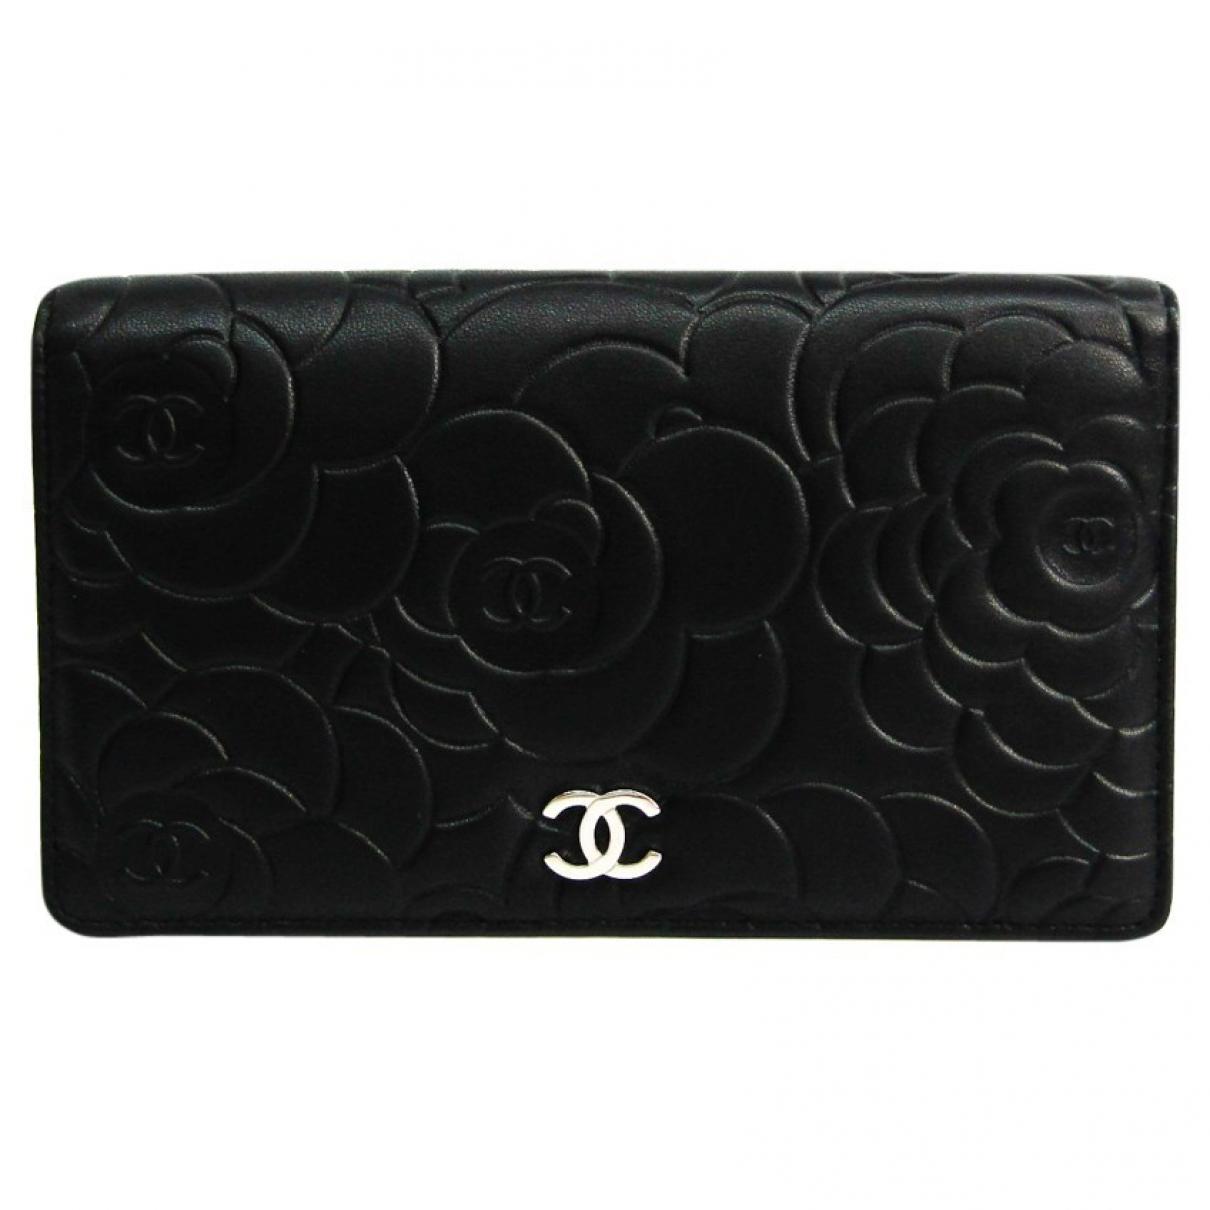 Chanel N Black Leather wallet for Women N